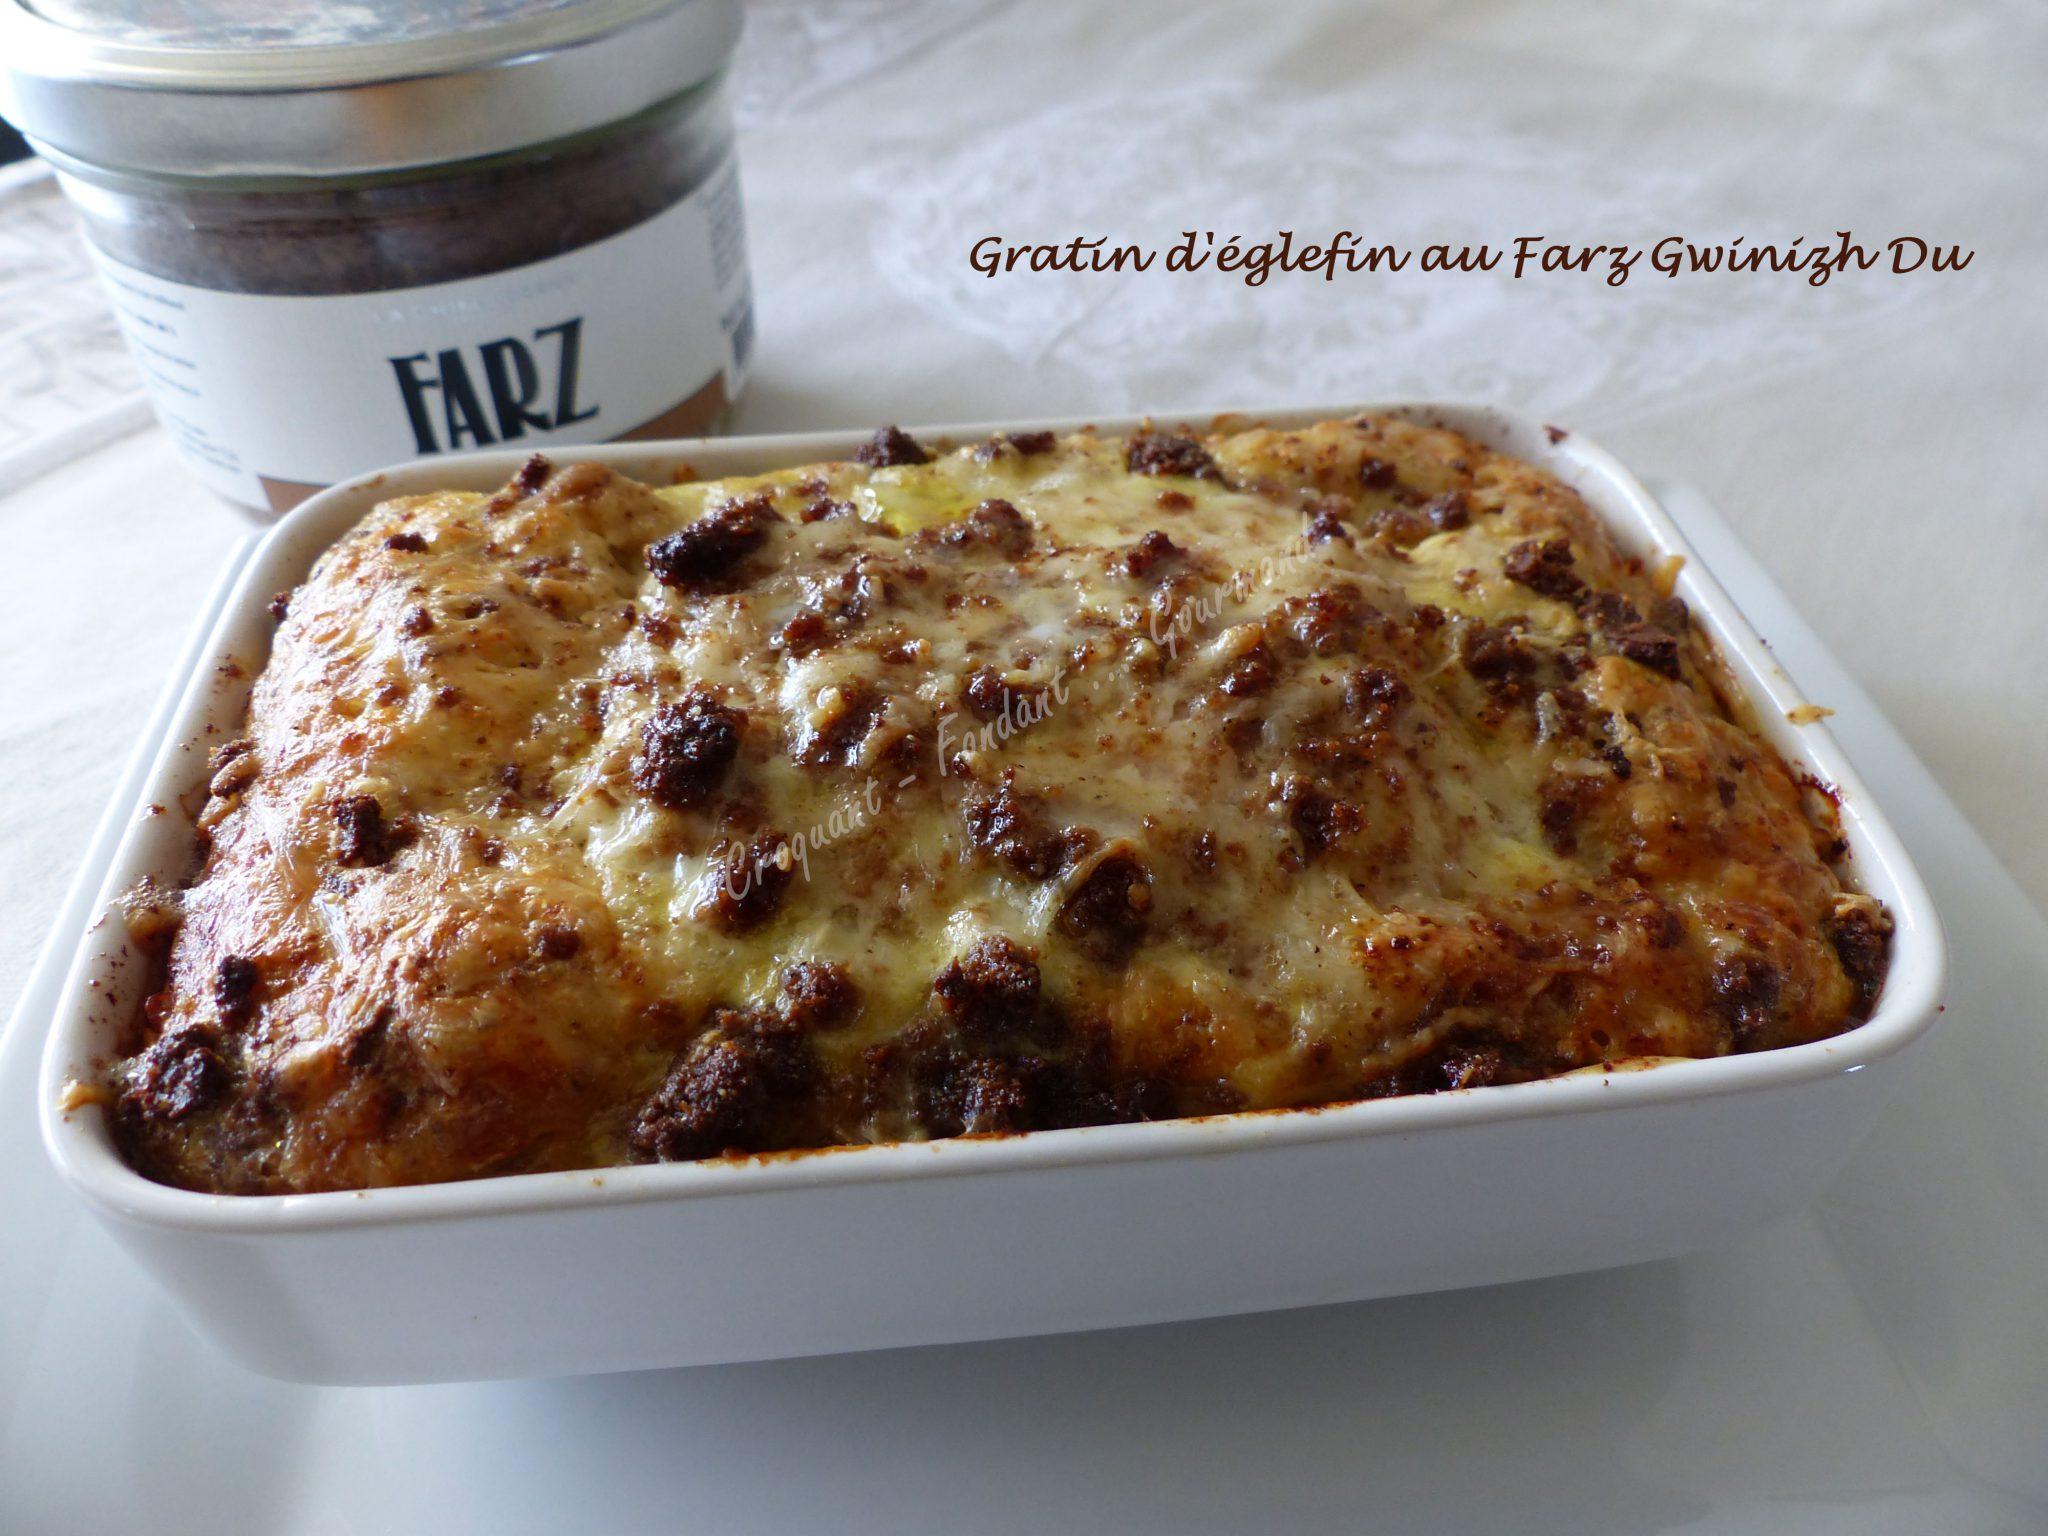 gratin-deglefin-au-farz-gwinizh-du-p1050518-1